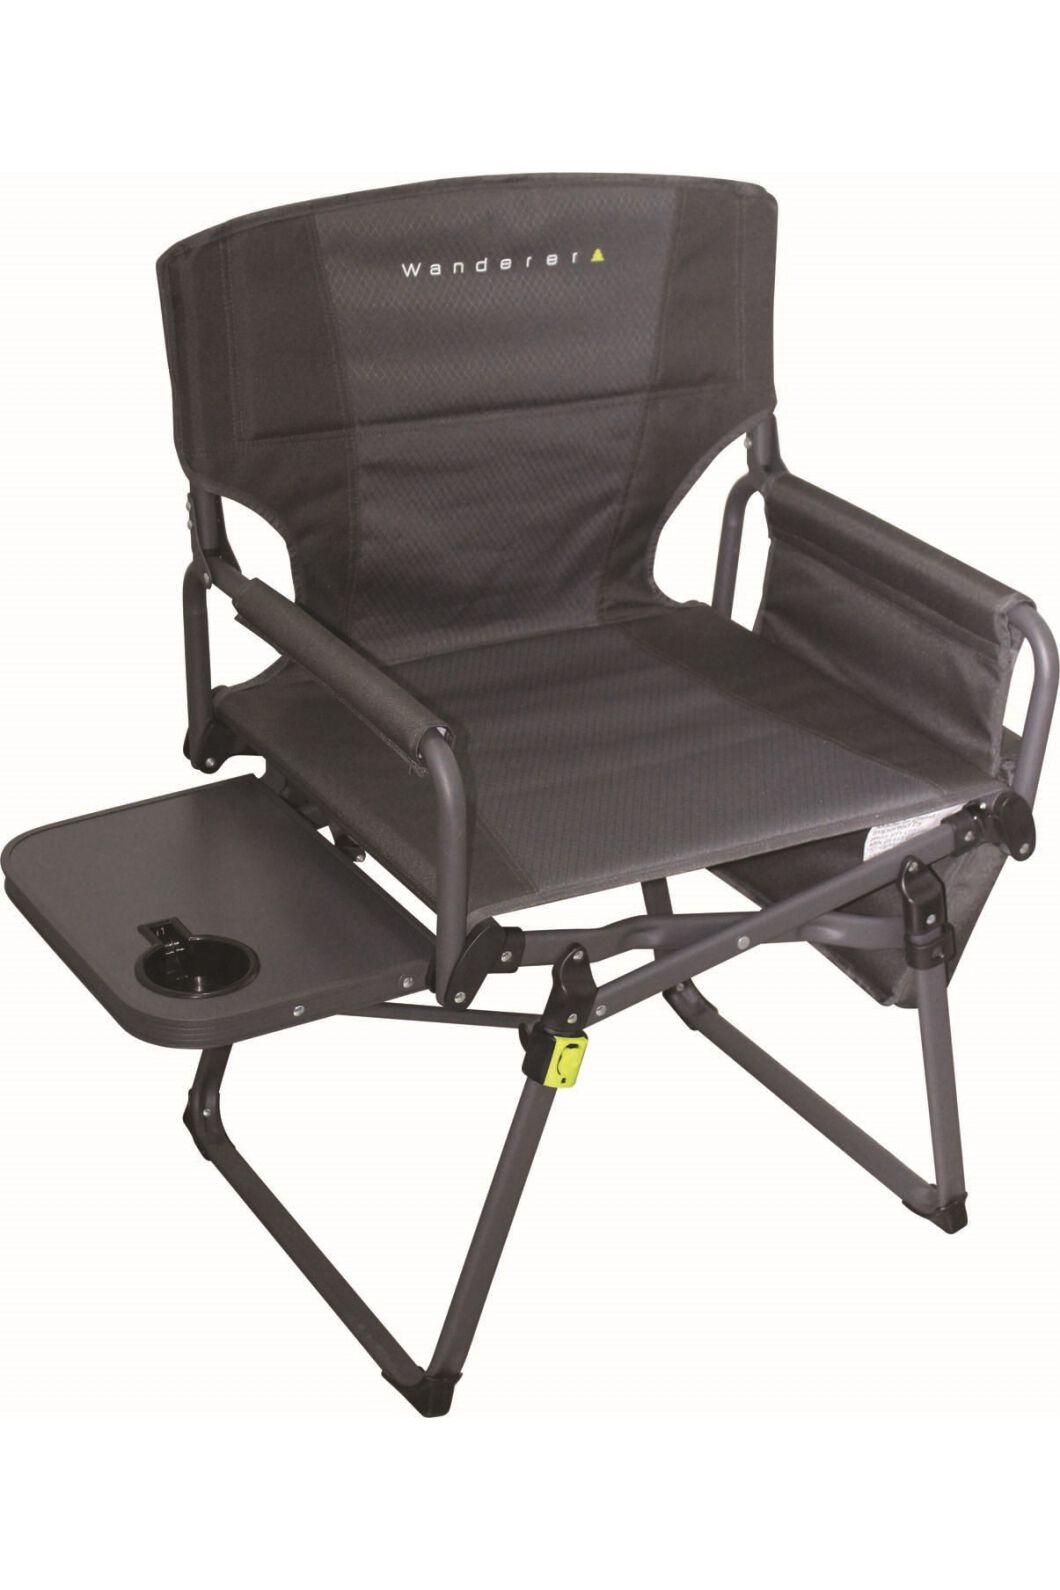 Wanderer Compact Directors Chair, None, hi-res